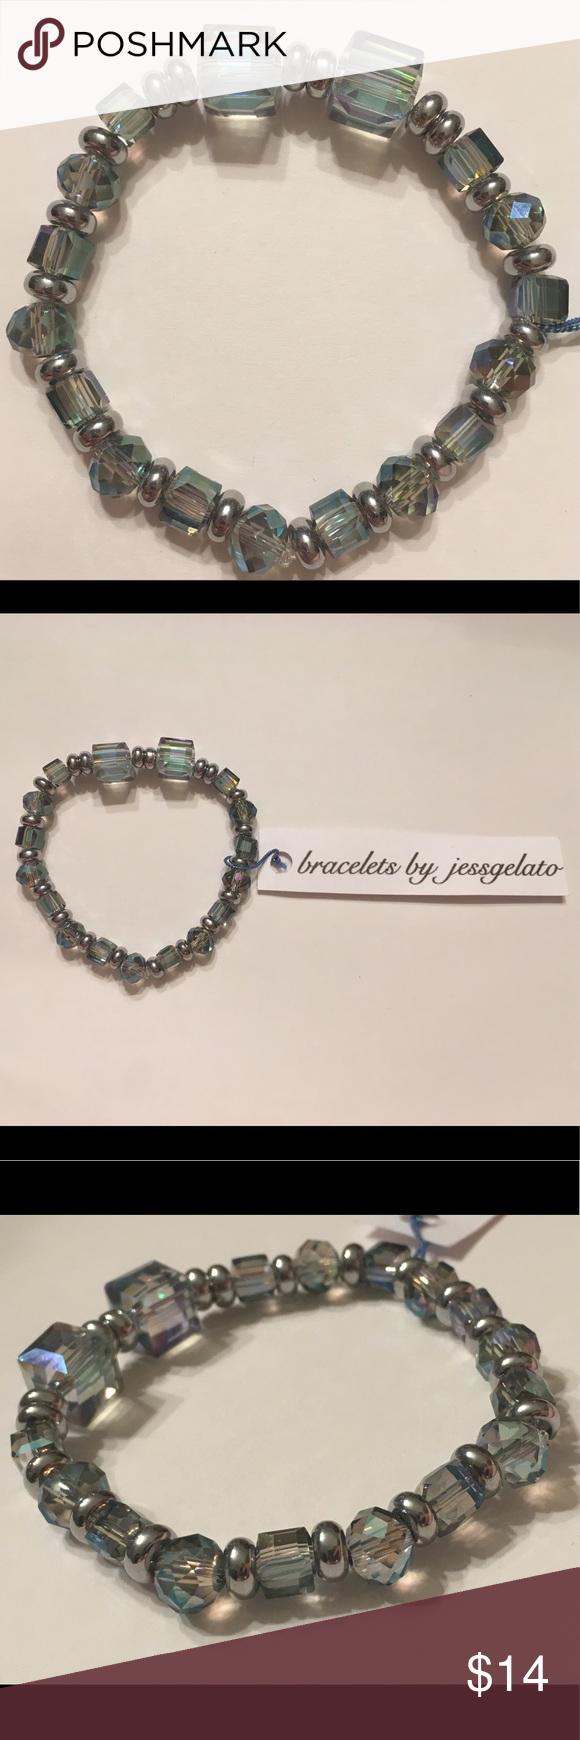 Handmade gem stone and silver beaded bracelet Handmade gem